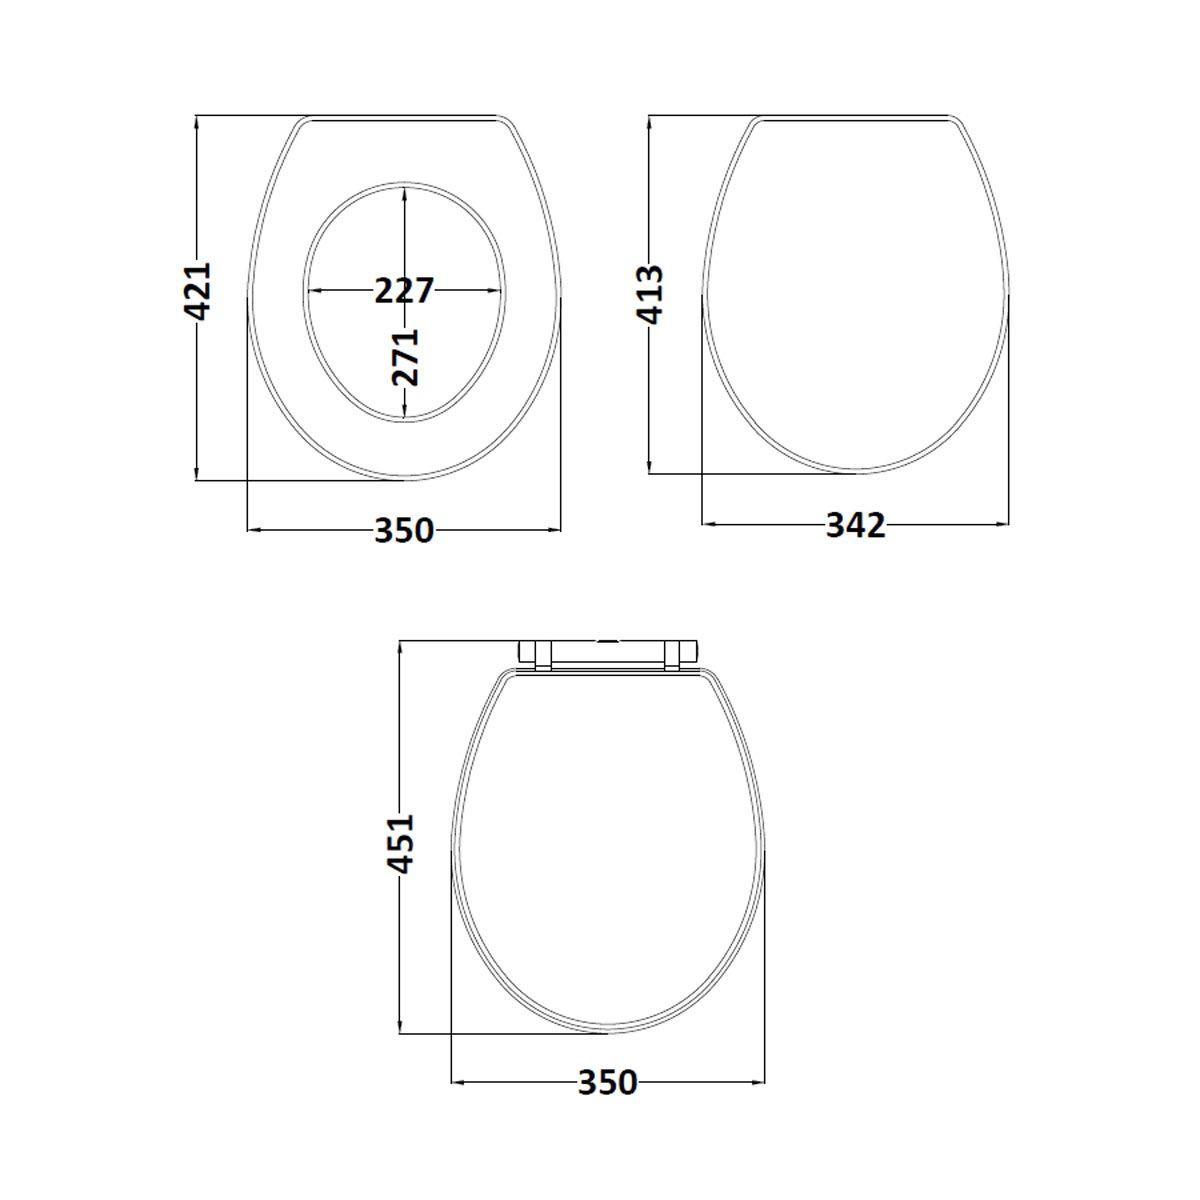 Richmond & Carlton Storm Grey Soft Close Toilet Seat Dimensions